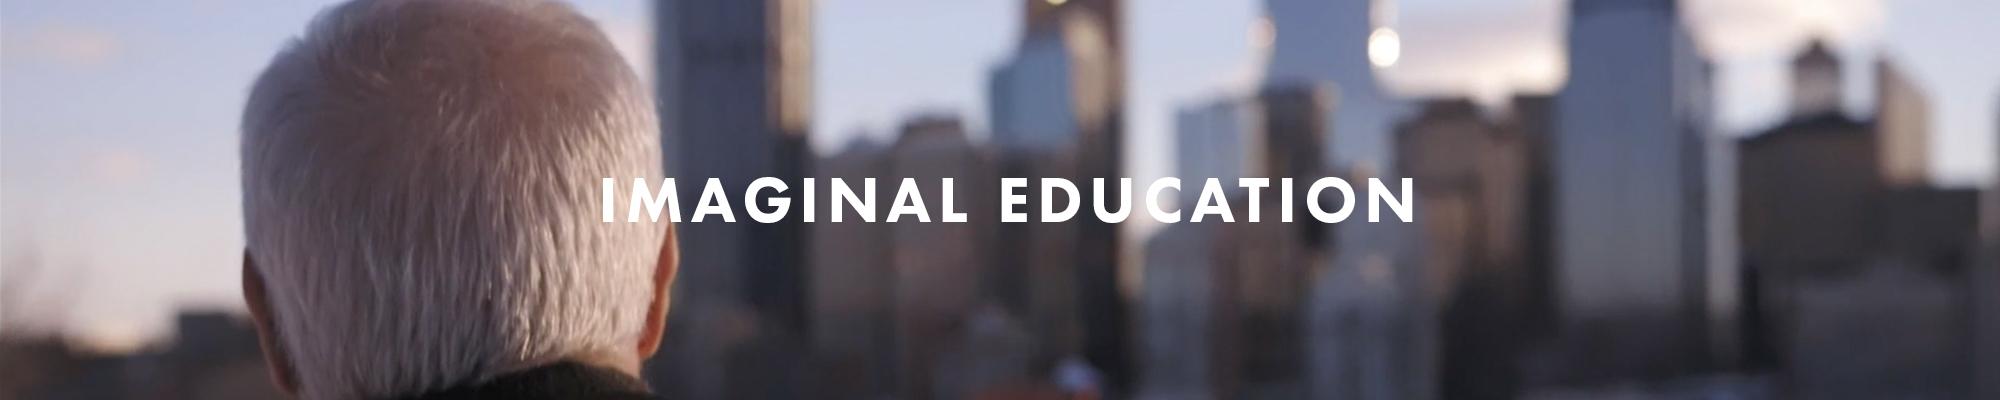 Imaginal Education Banner.jpg